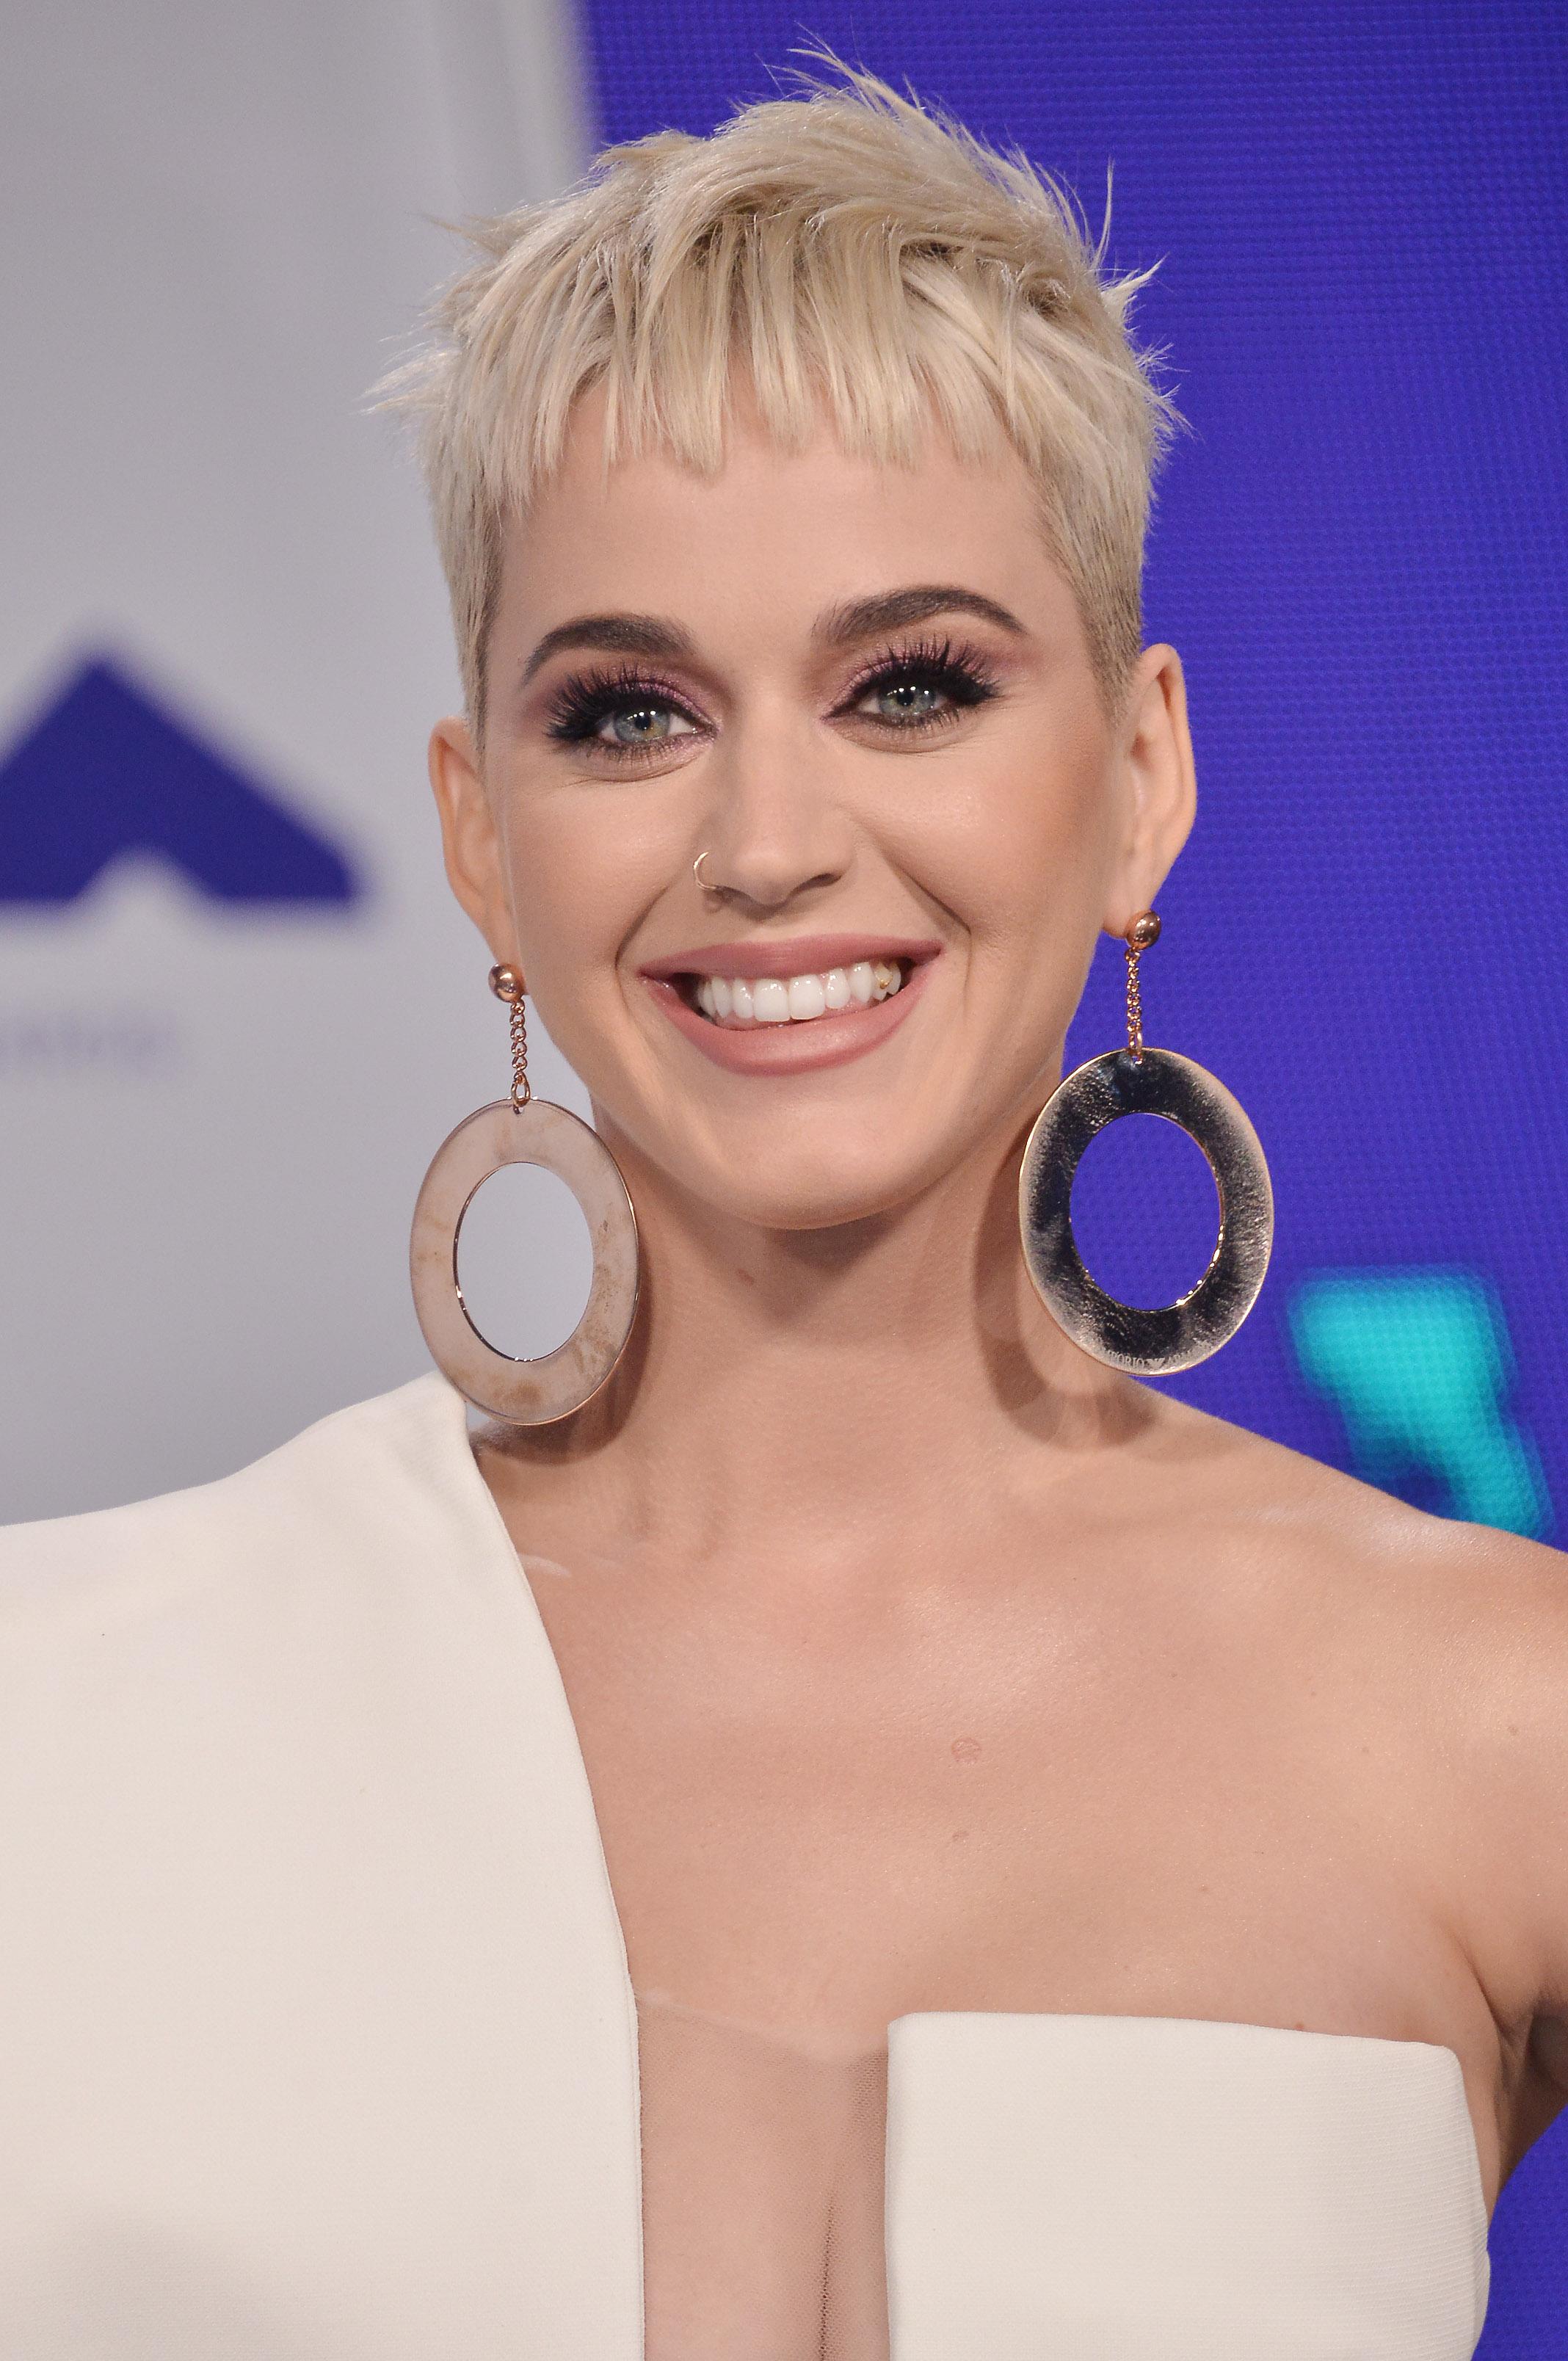 Katy Perry: τι σχέση έχει το νέο της κούρεμα με τον τρόπο που βάφεται! | tlife.gr